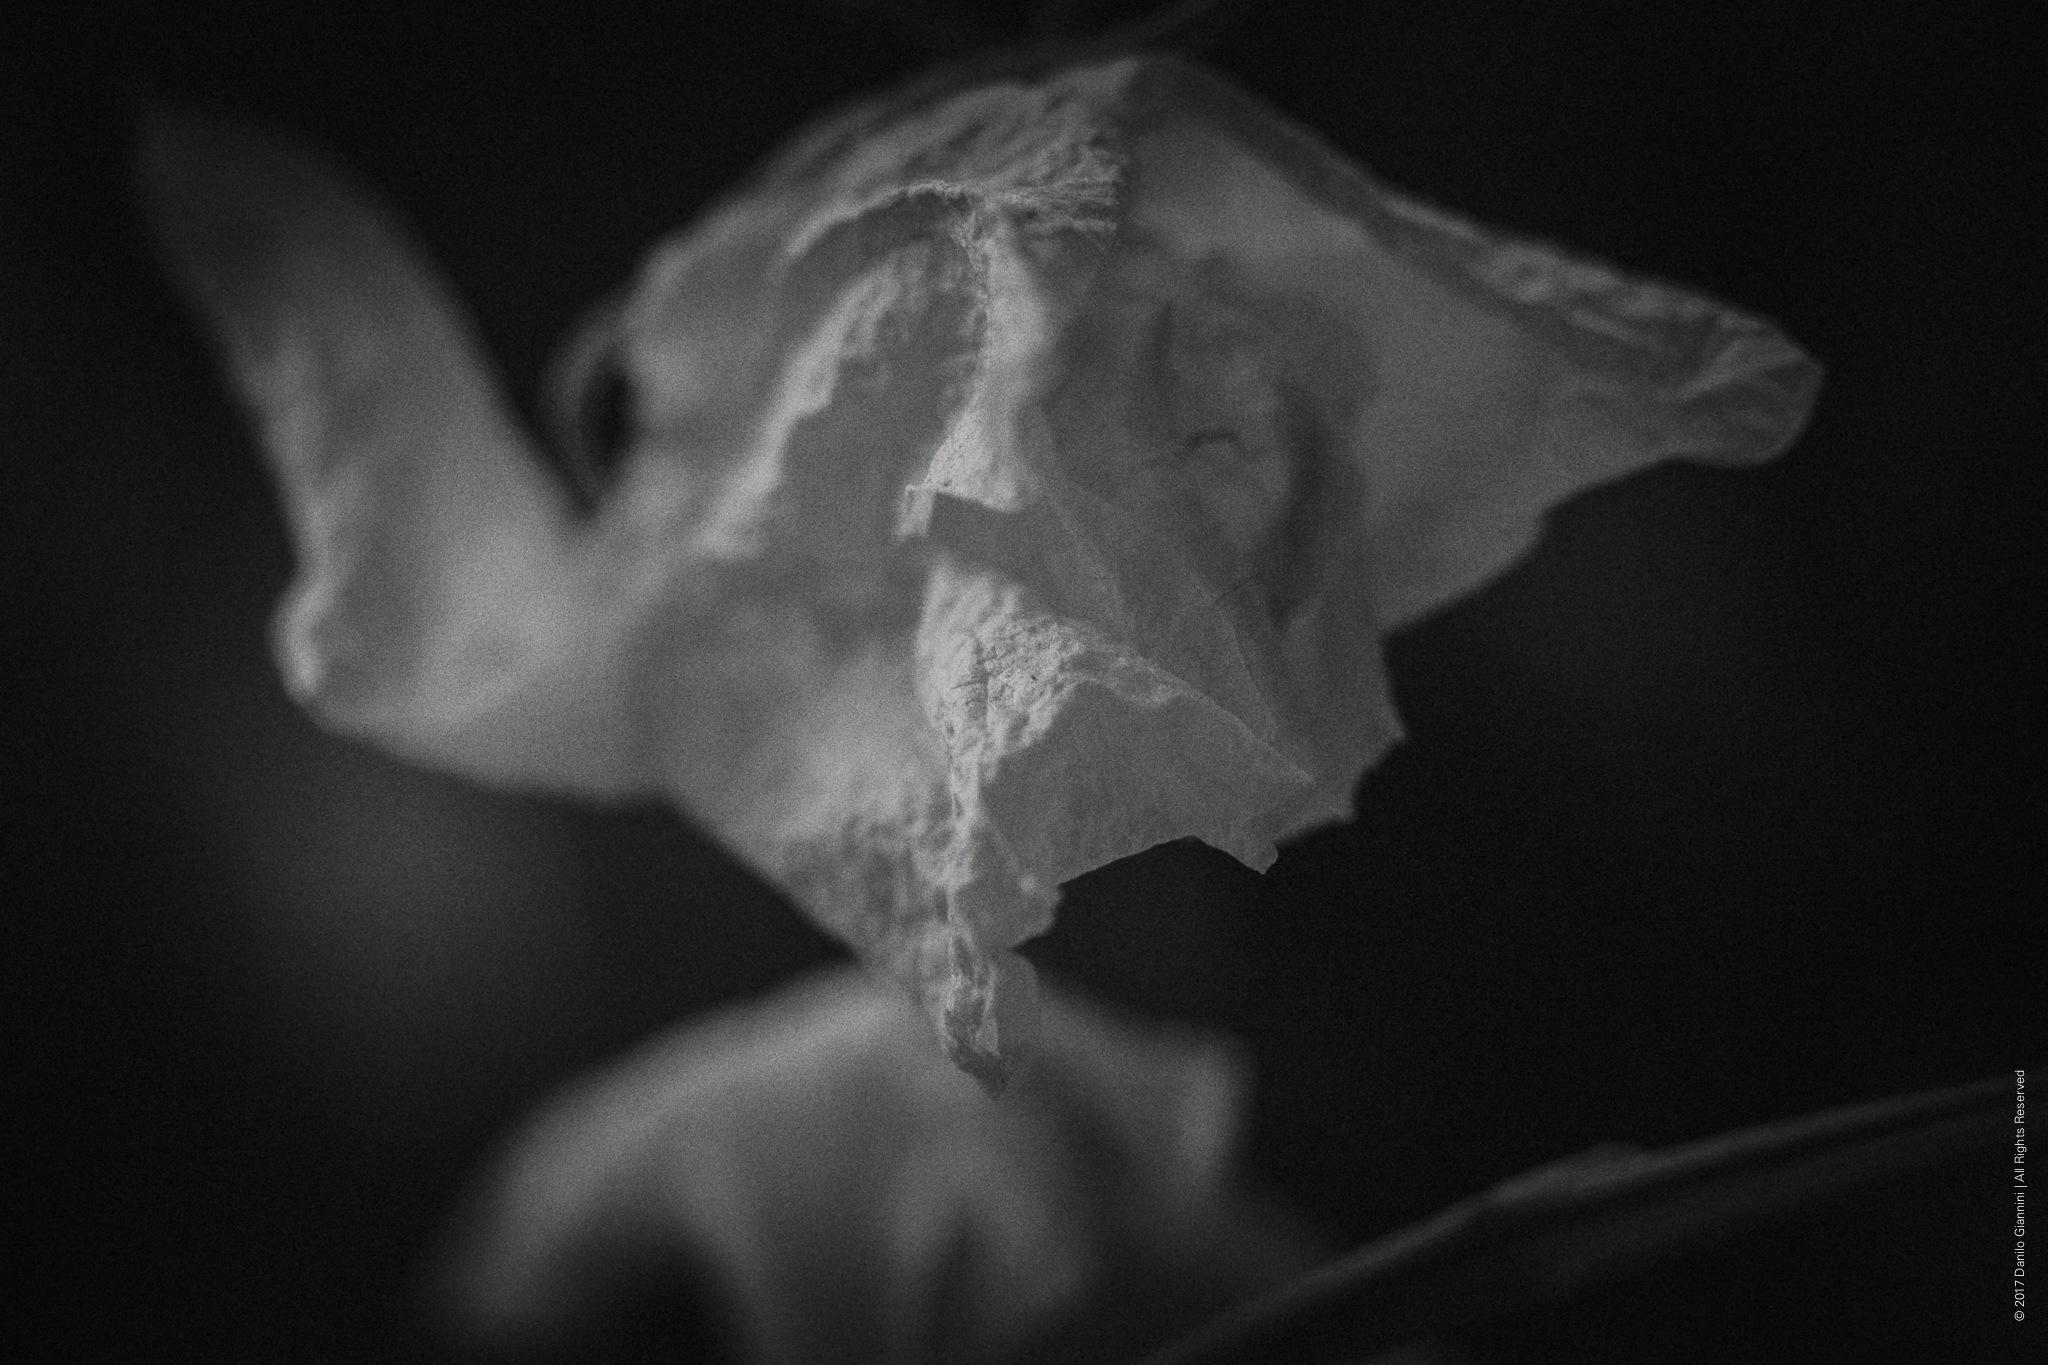 Dried Flowers by Danilo Giannini